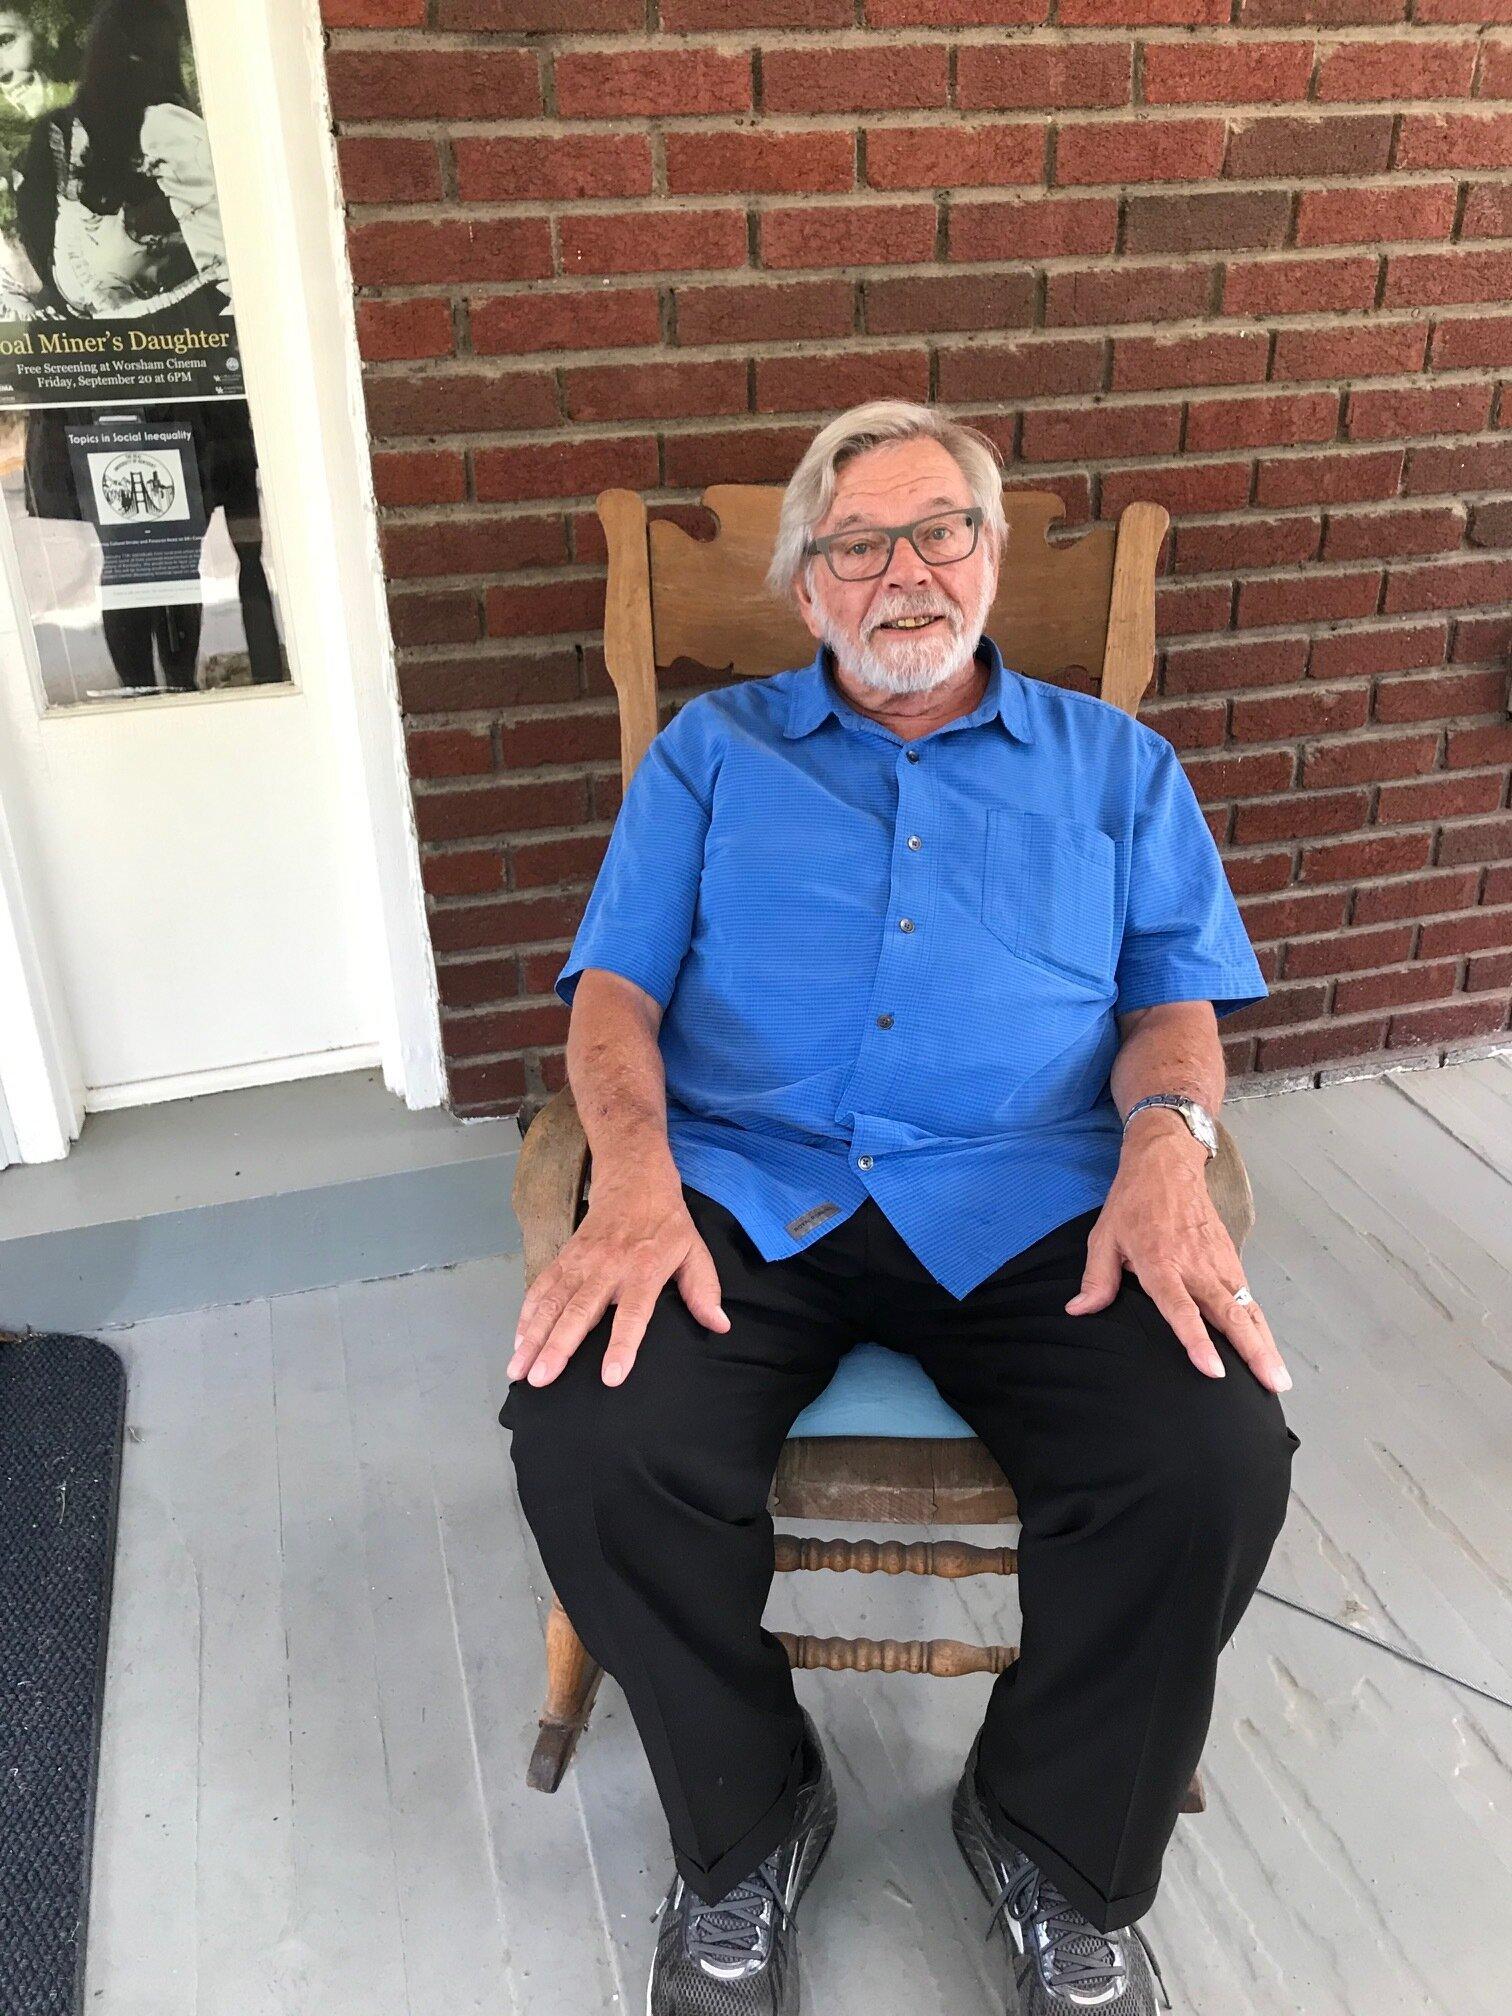 Dwight Billings at the University of Kentucky